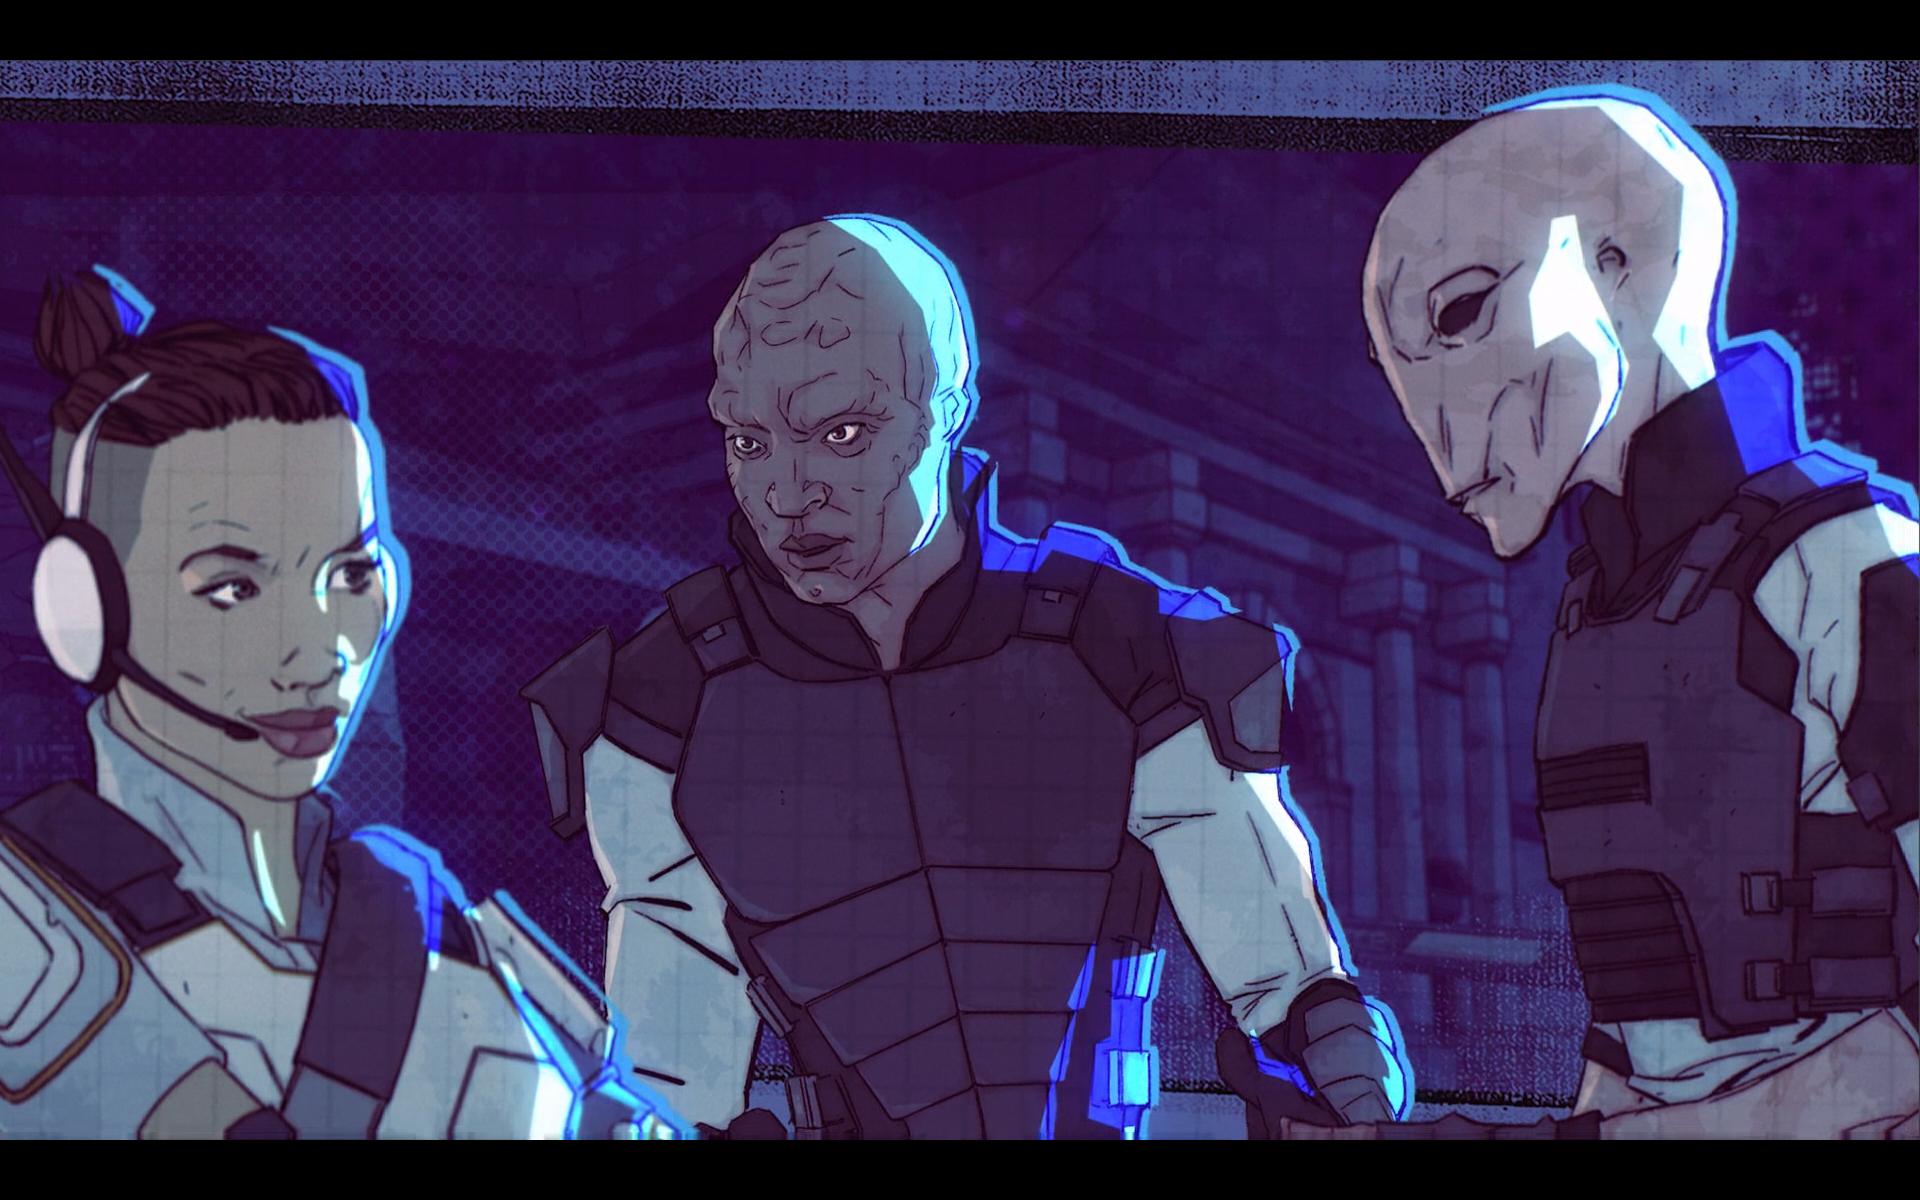 неММО: Chimera Squad: провал или спин-офф?